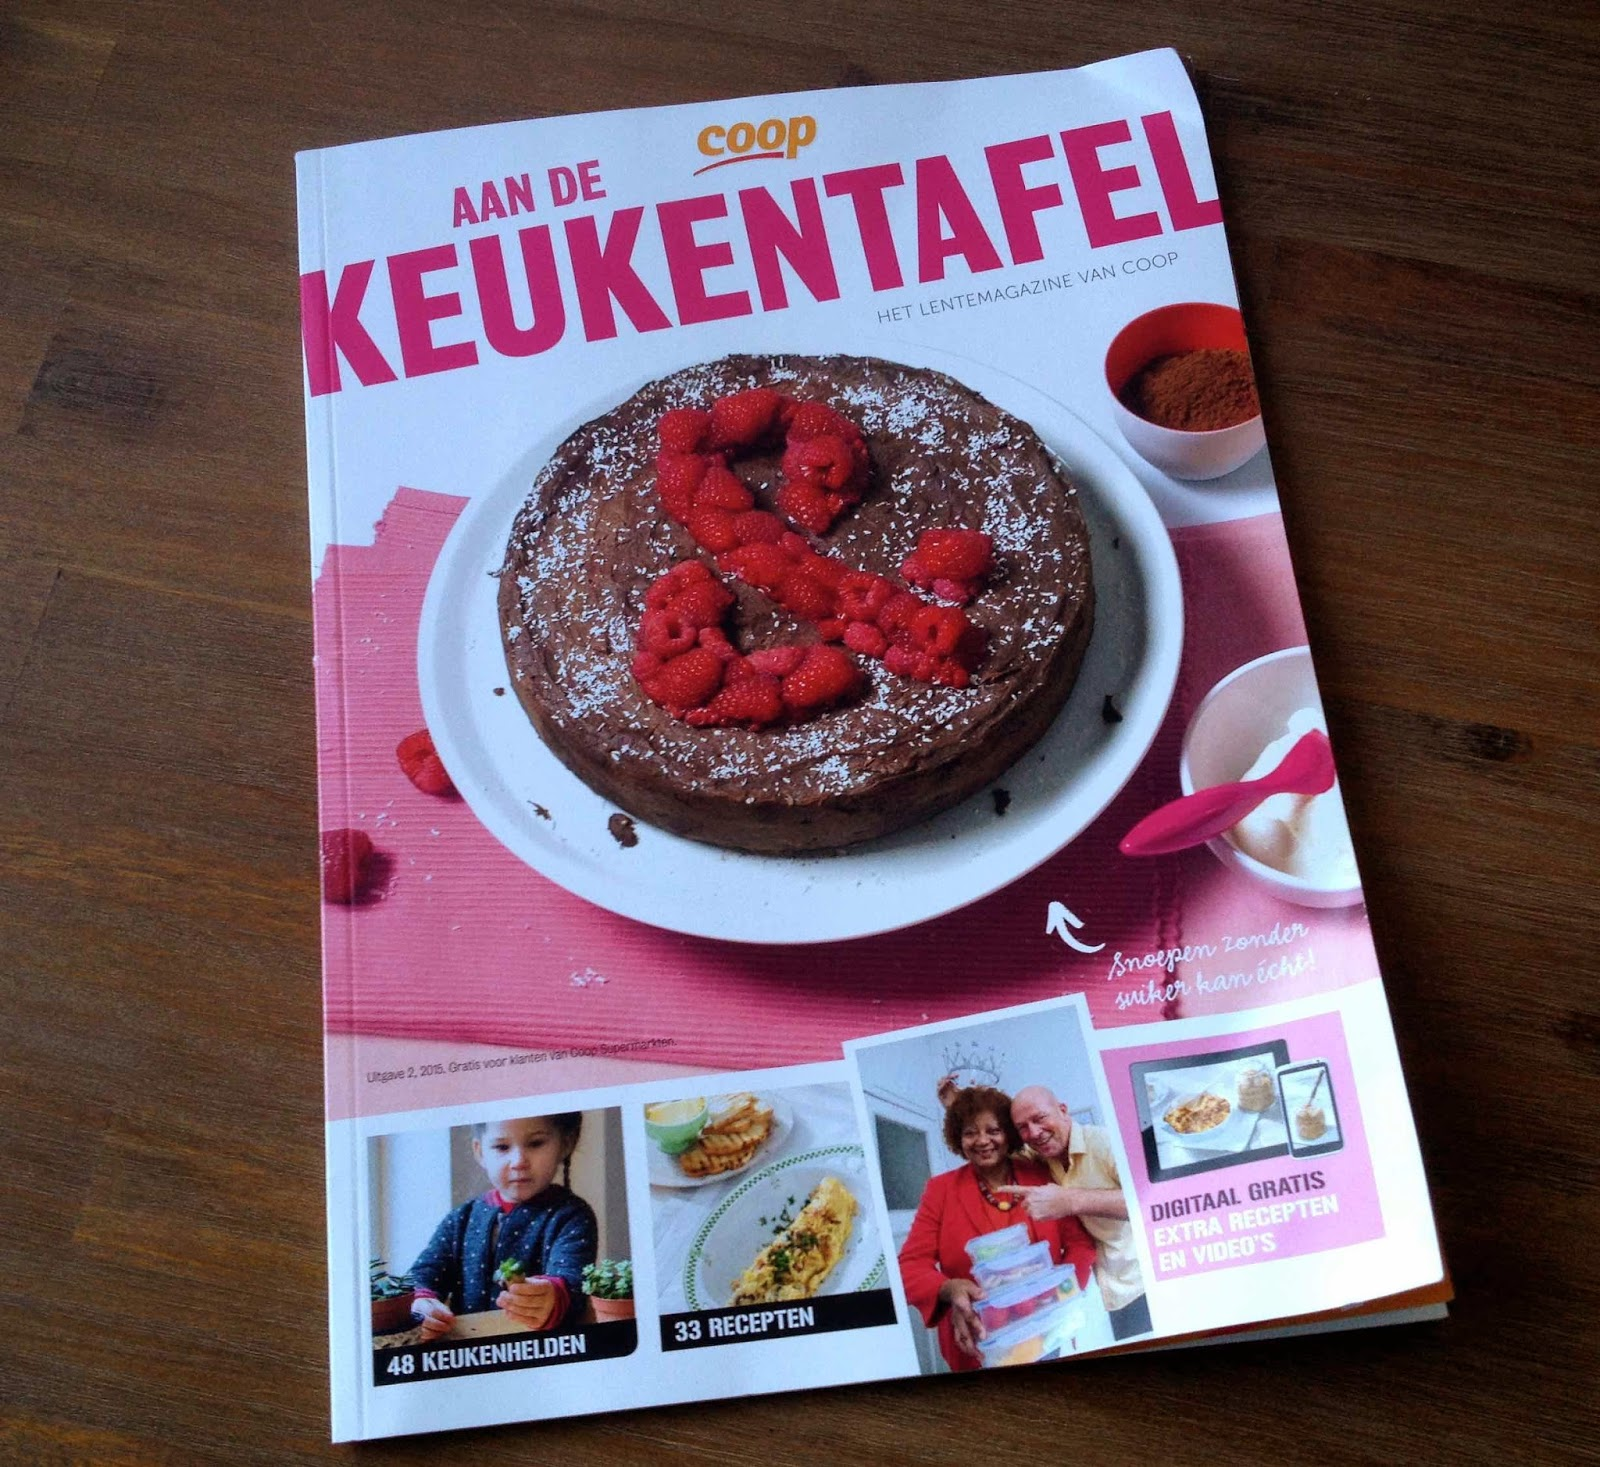 keukentafelmagazine